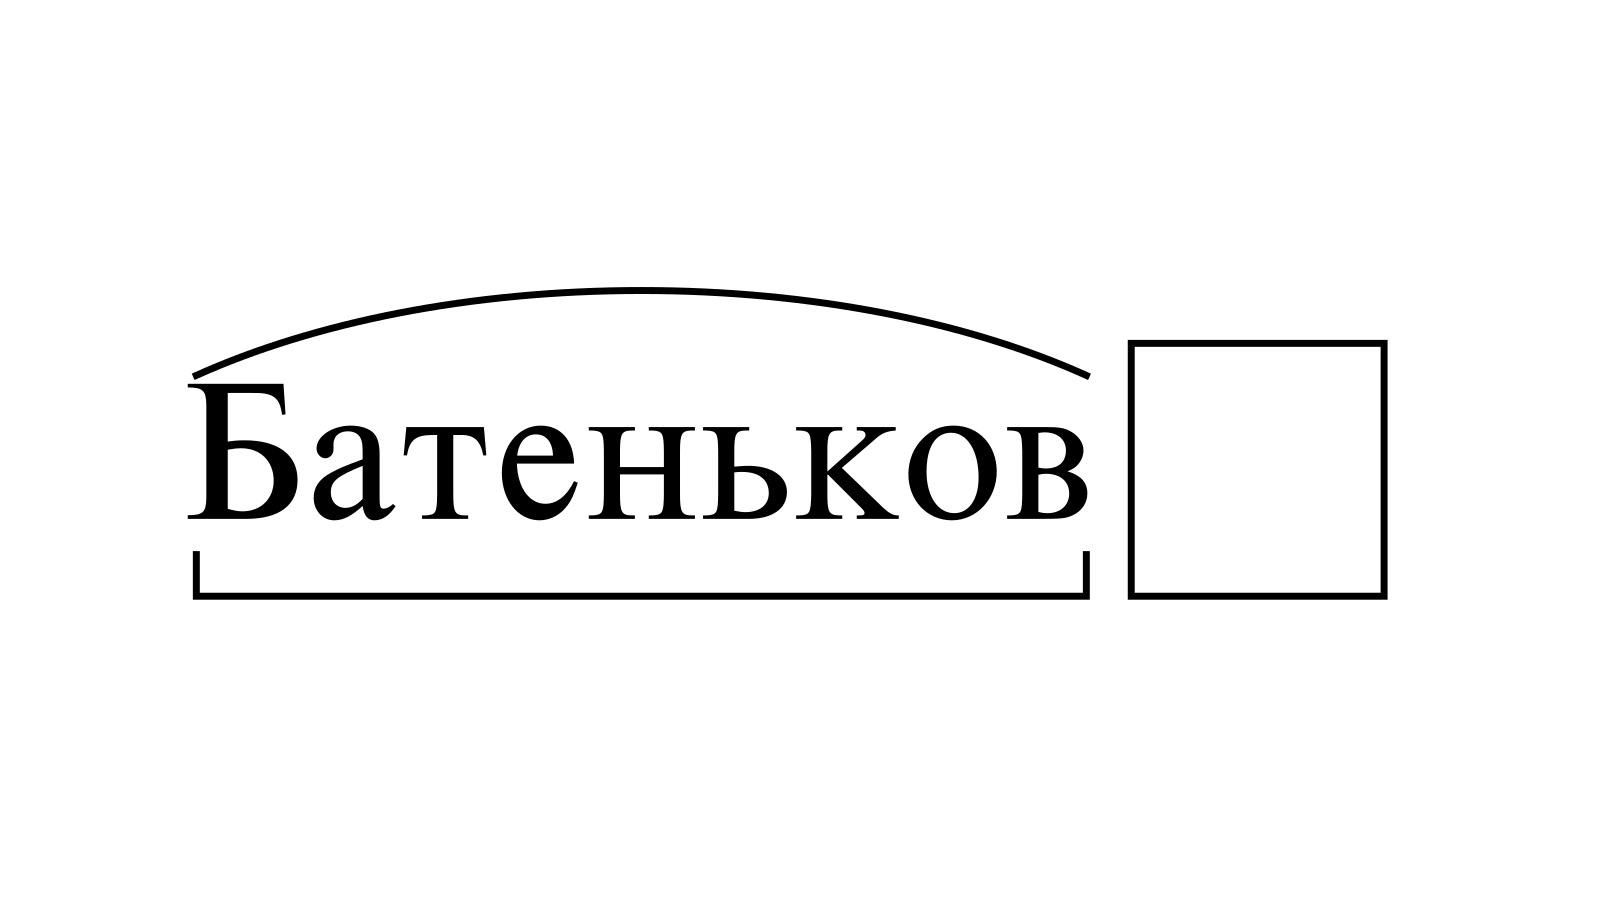 Разбор слова «Батеньков» по составу